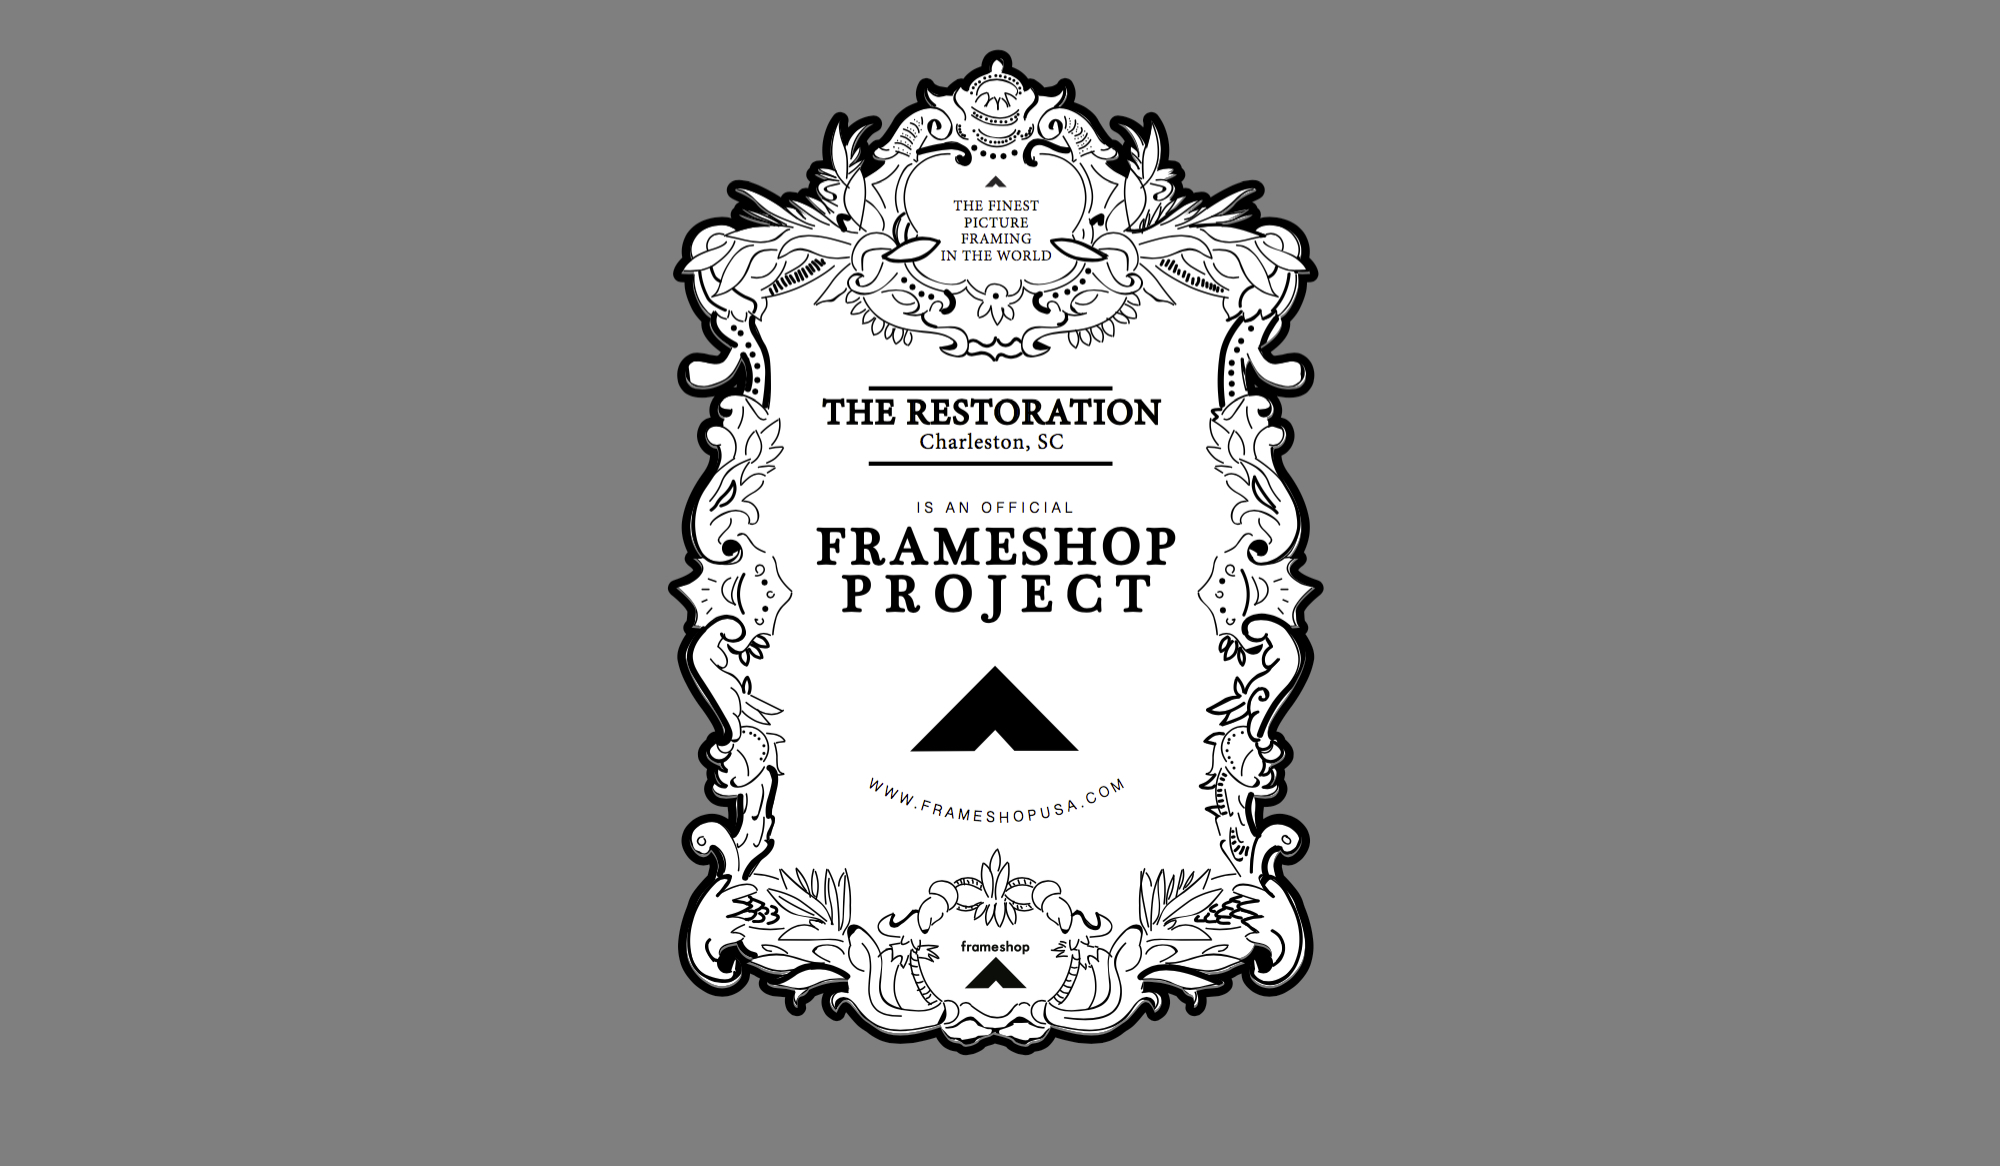 frameshop_project.jpg